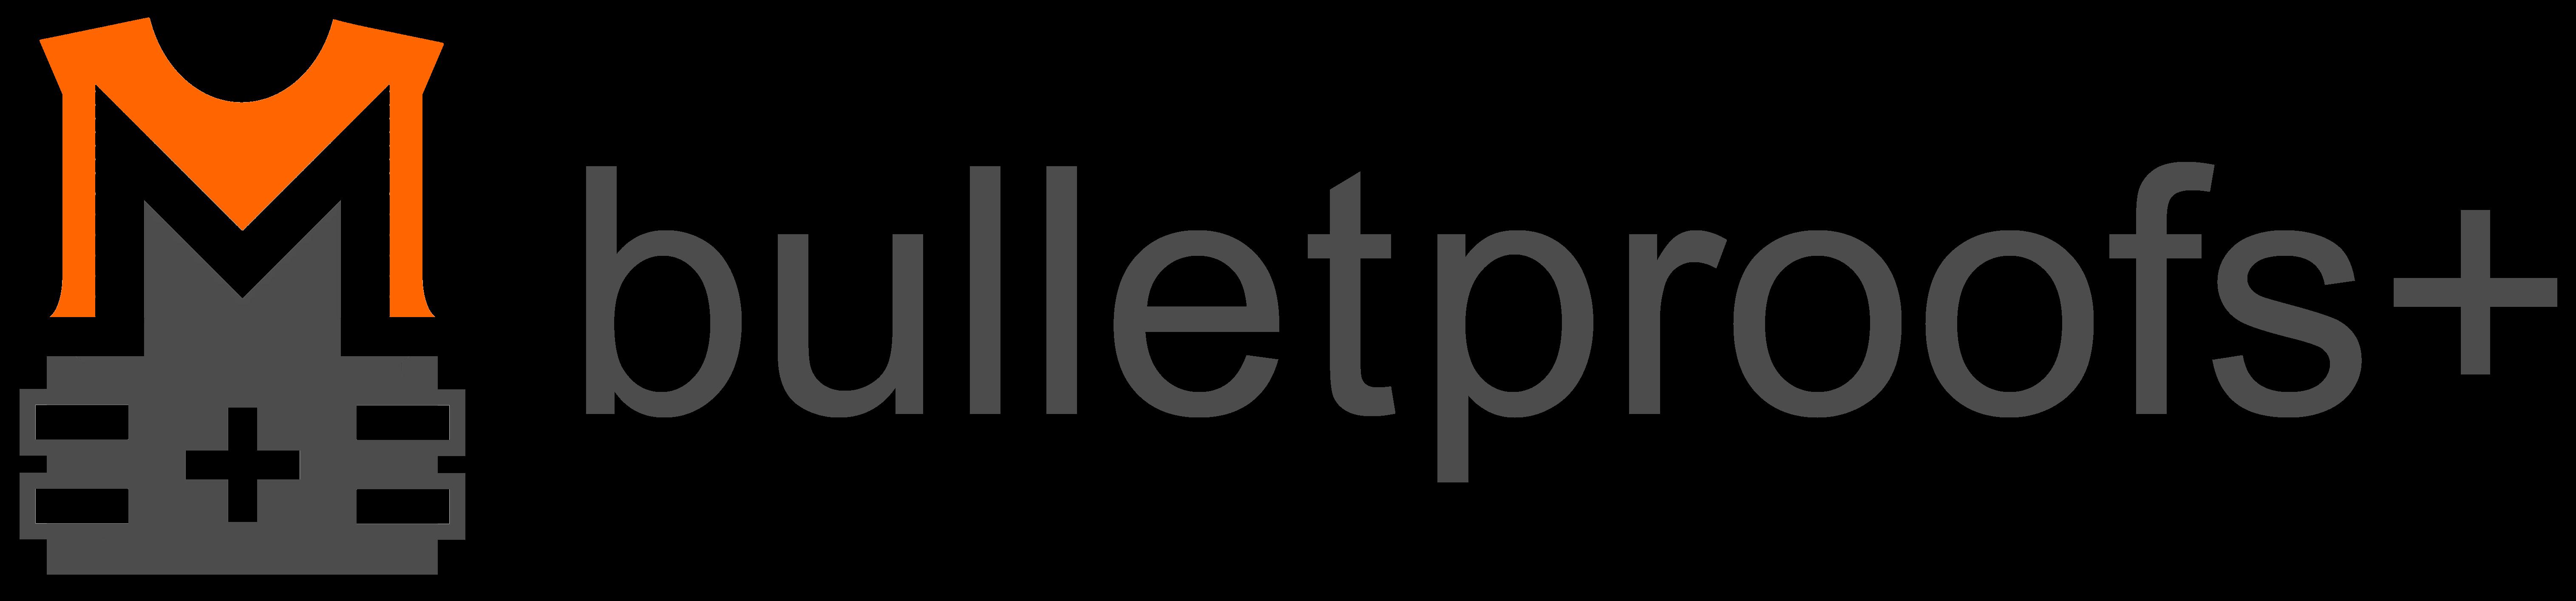 Bulletproofs+ logo